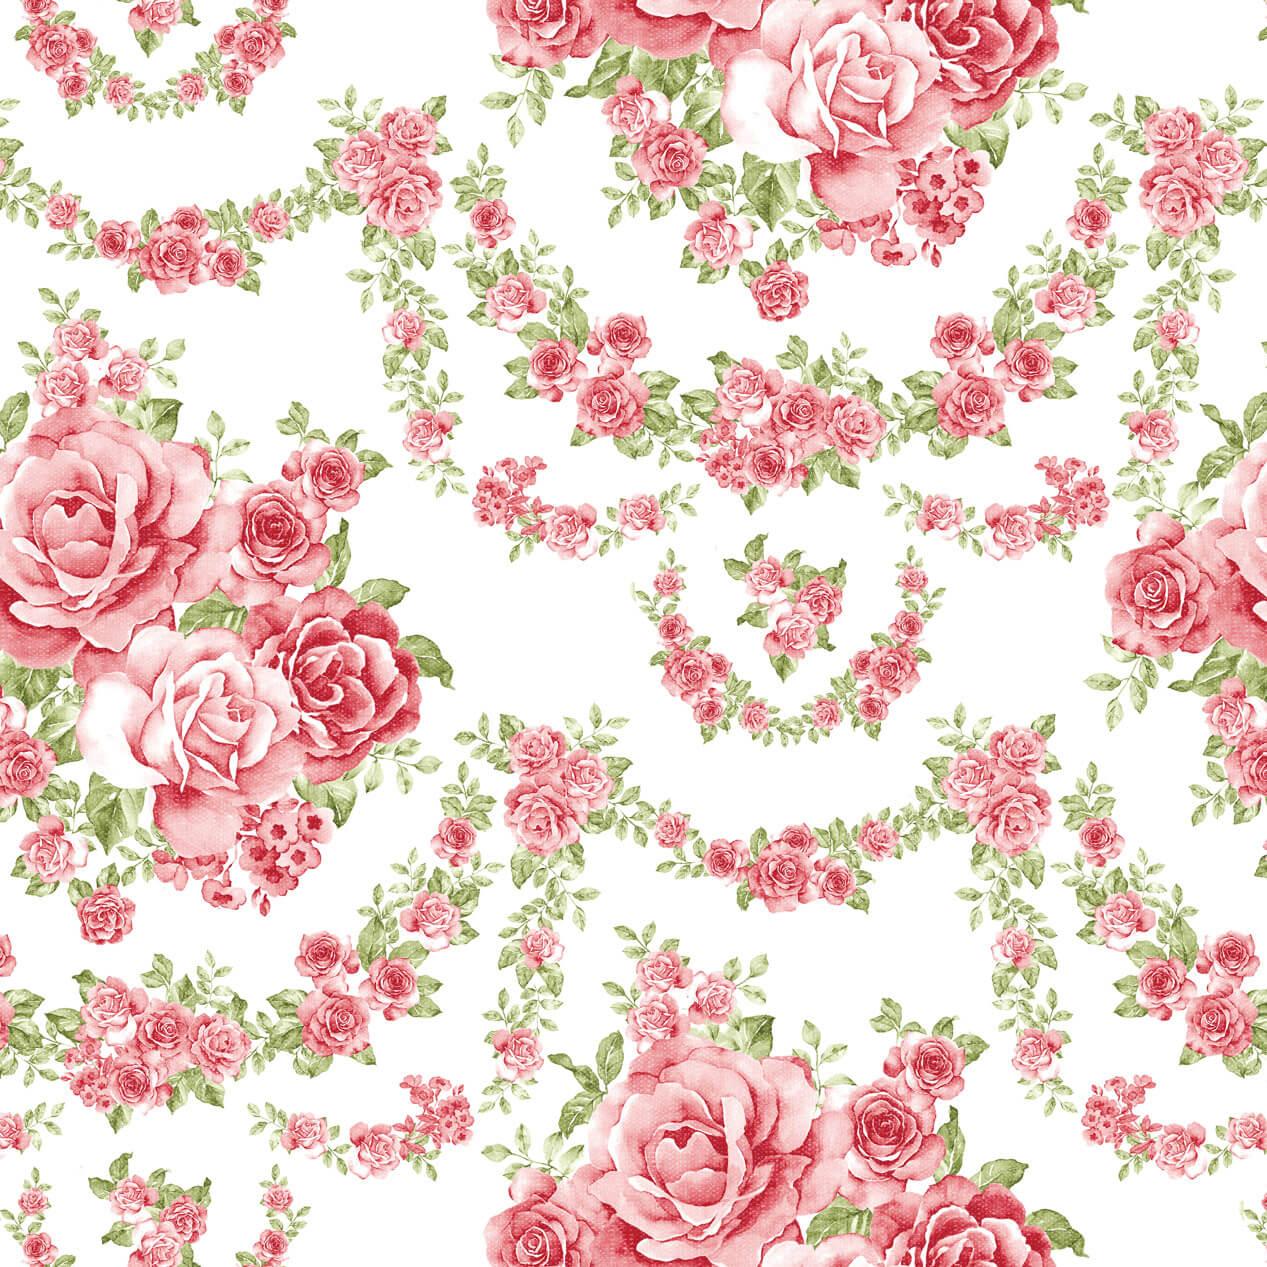 Papel de Parede Floral Mundo de Rosas